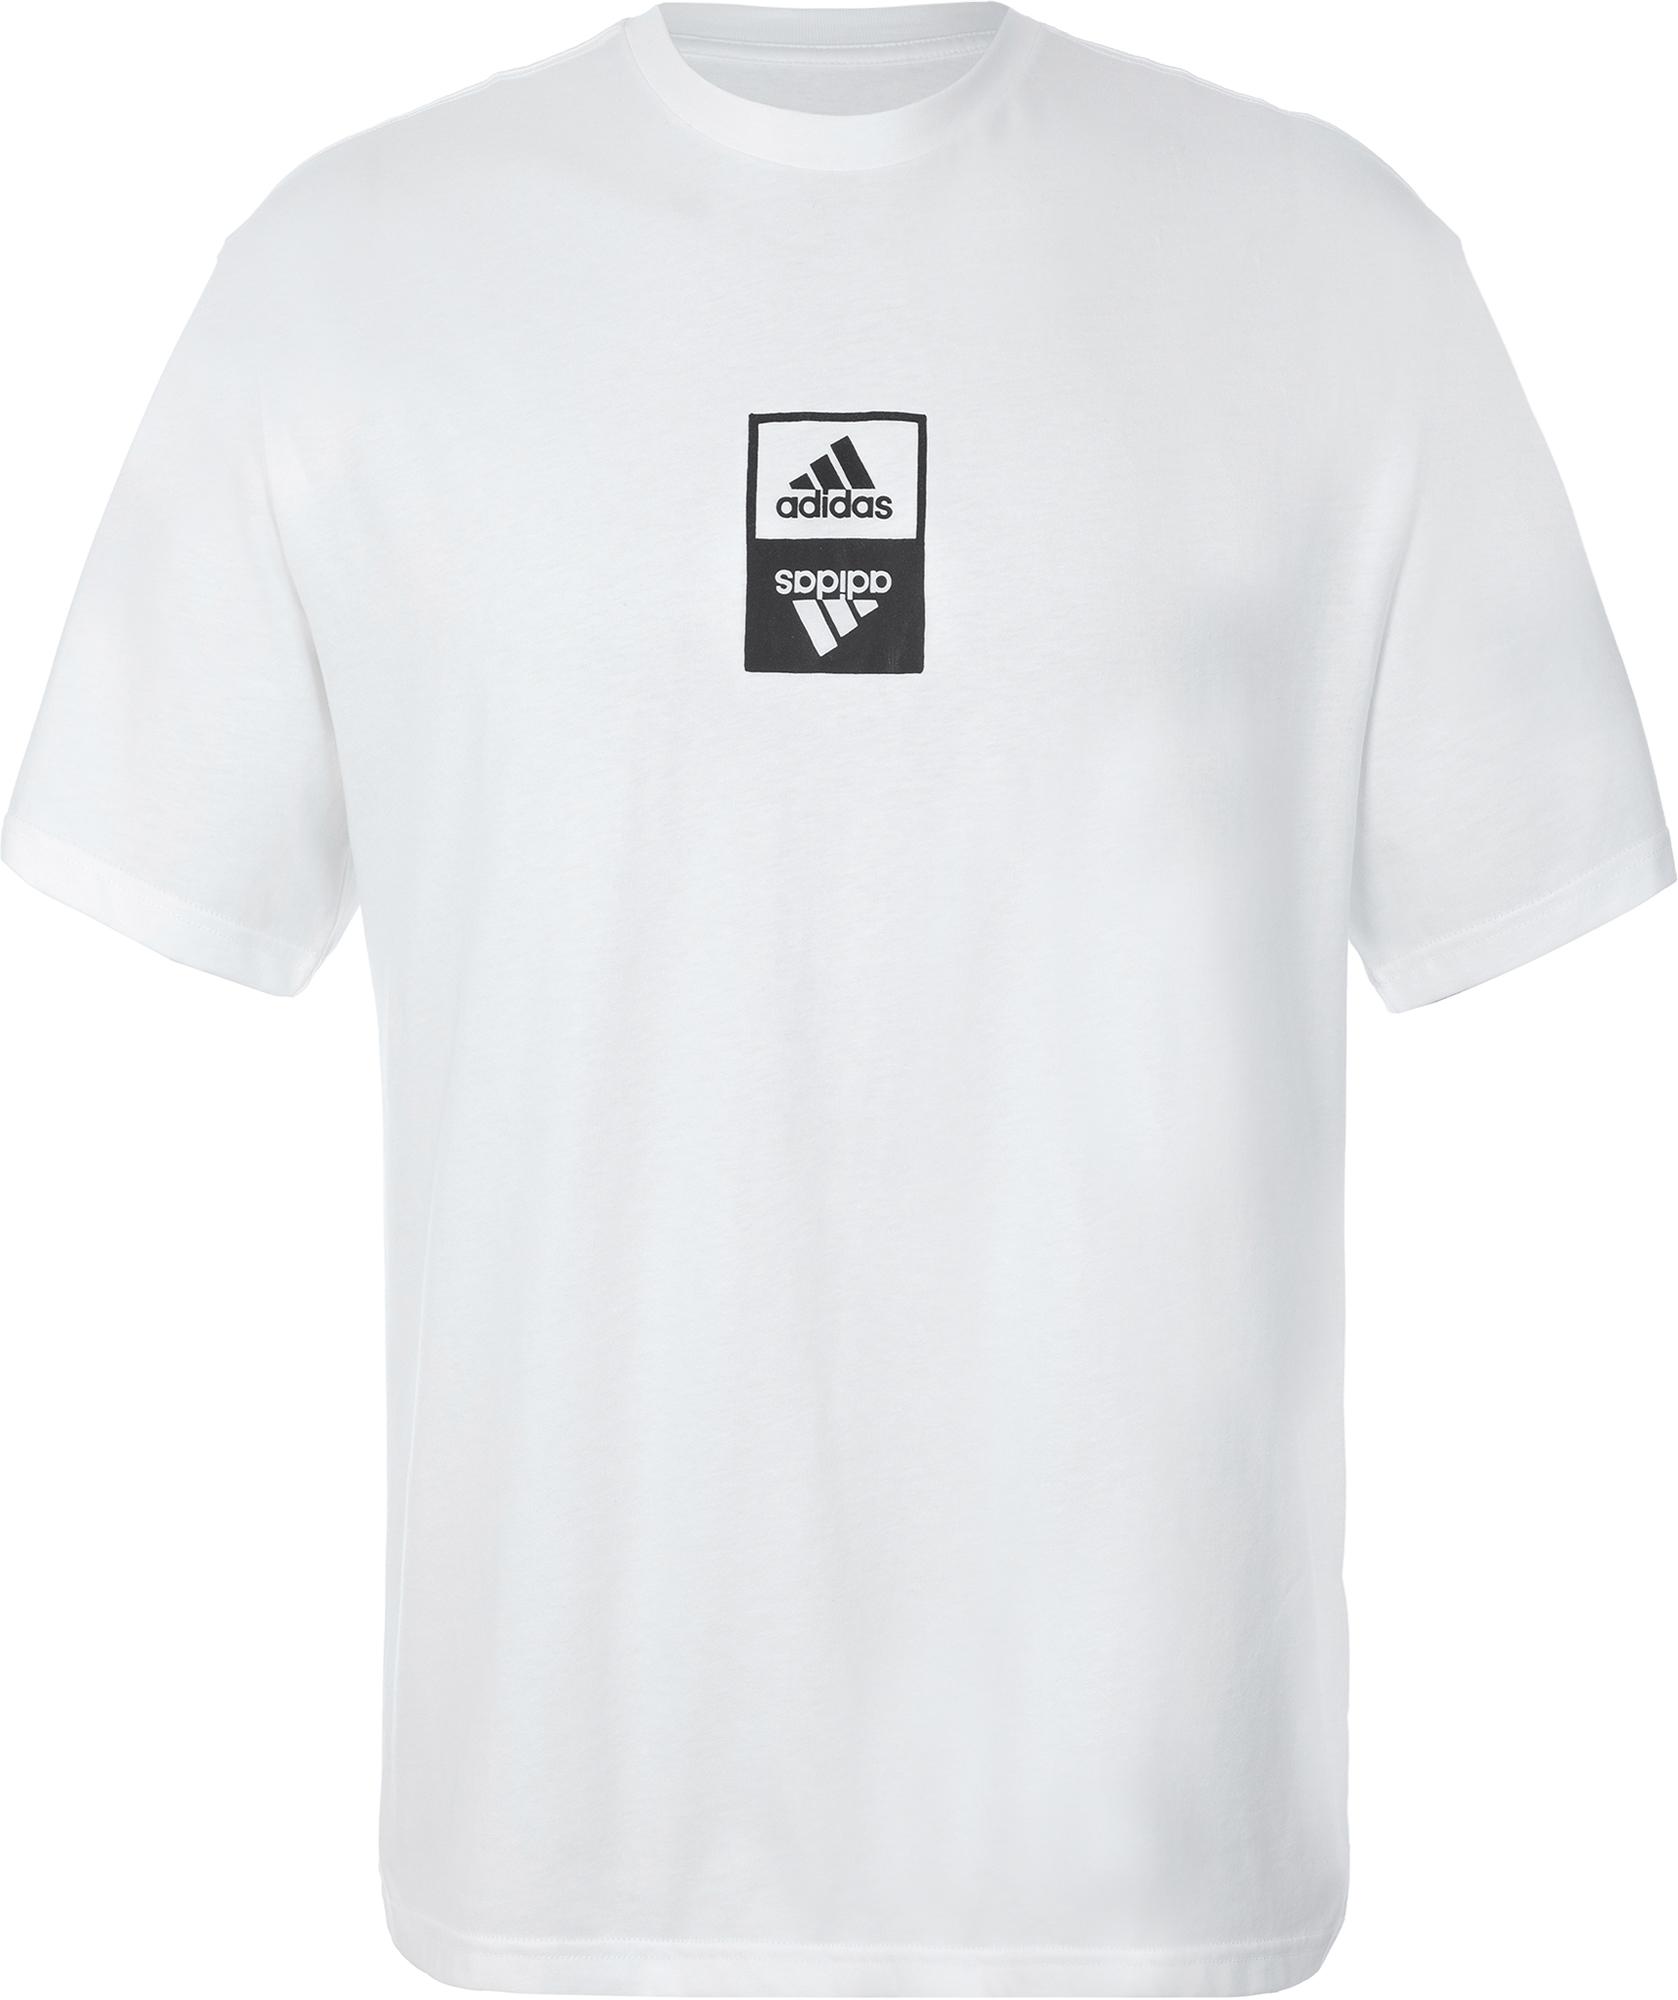 Adidas Футболка мужская OneTeam, размер 48